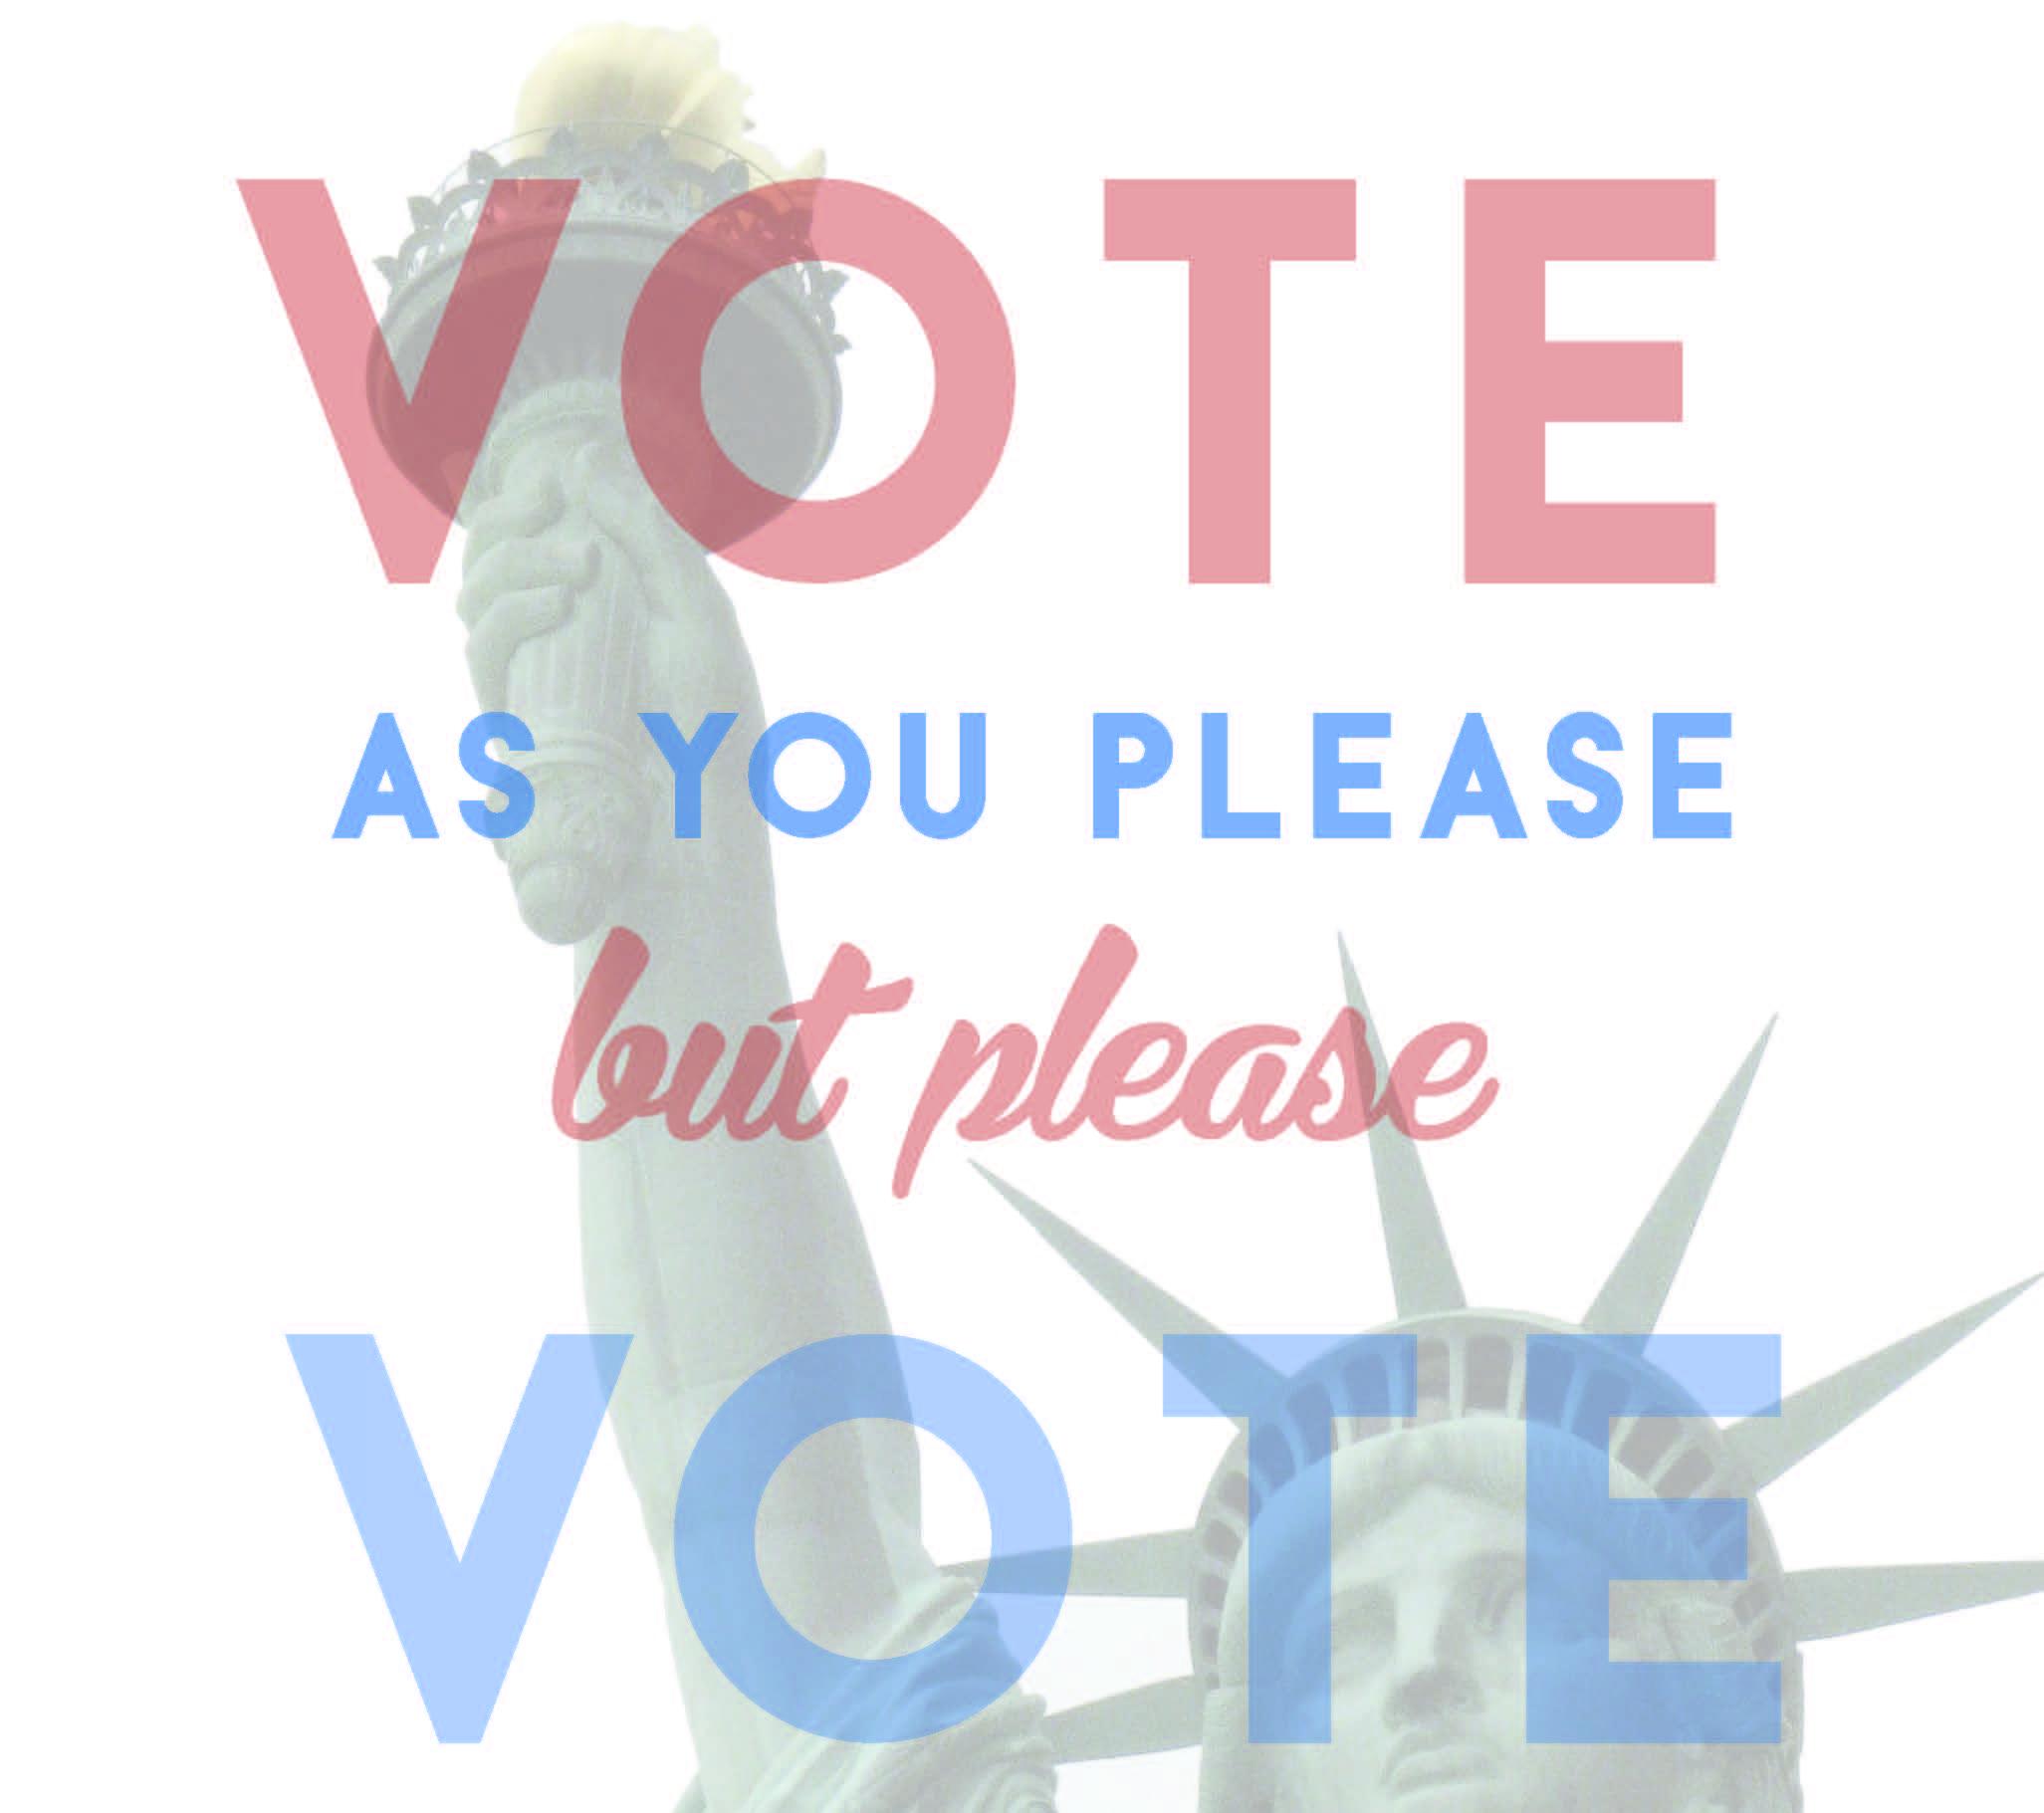 But Please Vote!